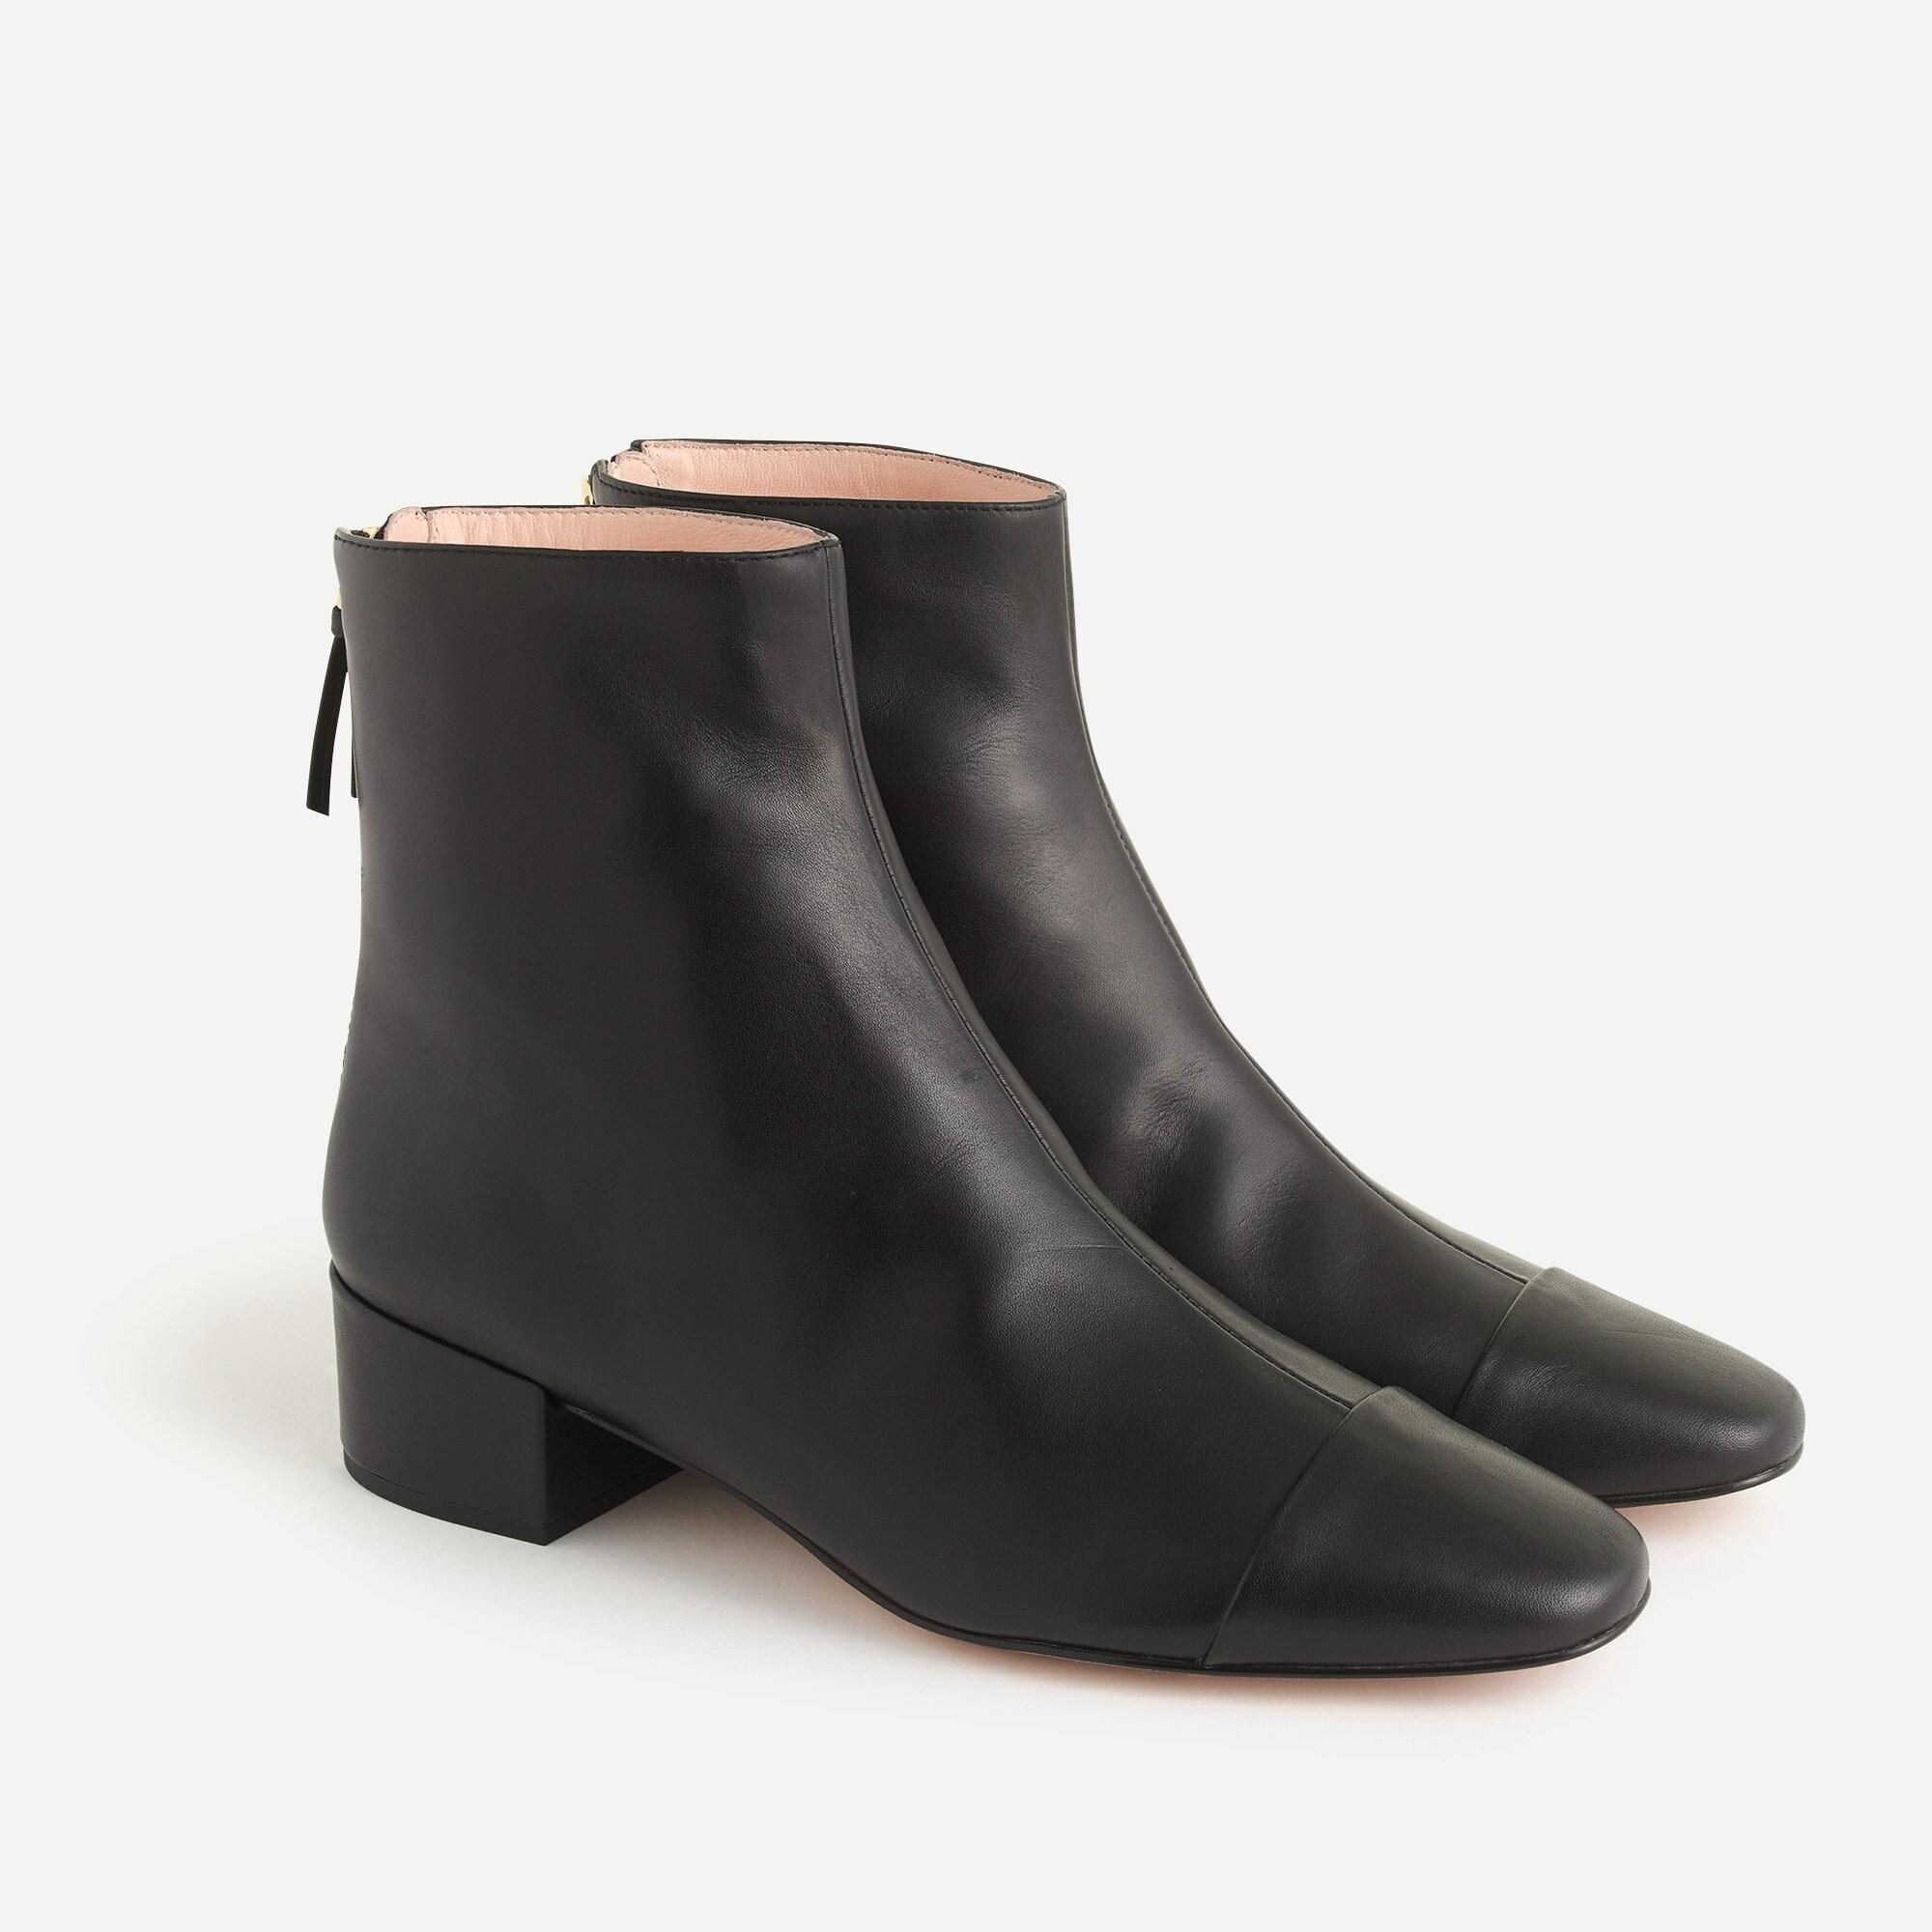 cap-toe ankle boots : women boots